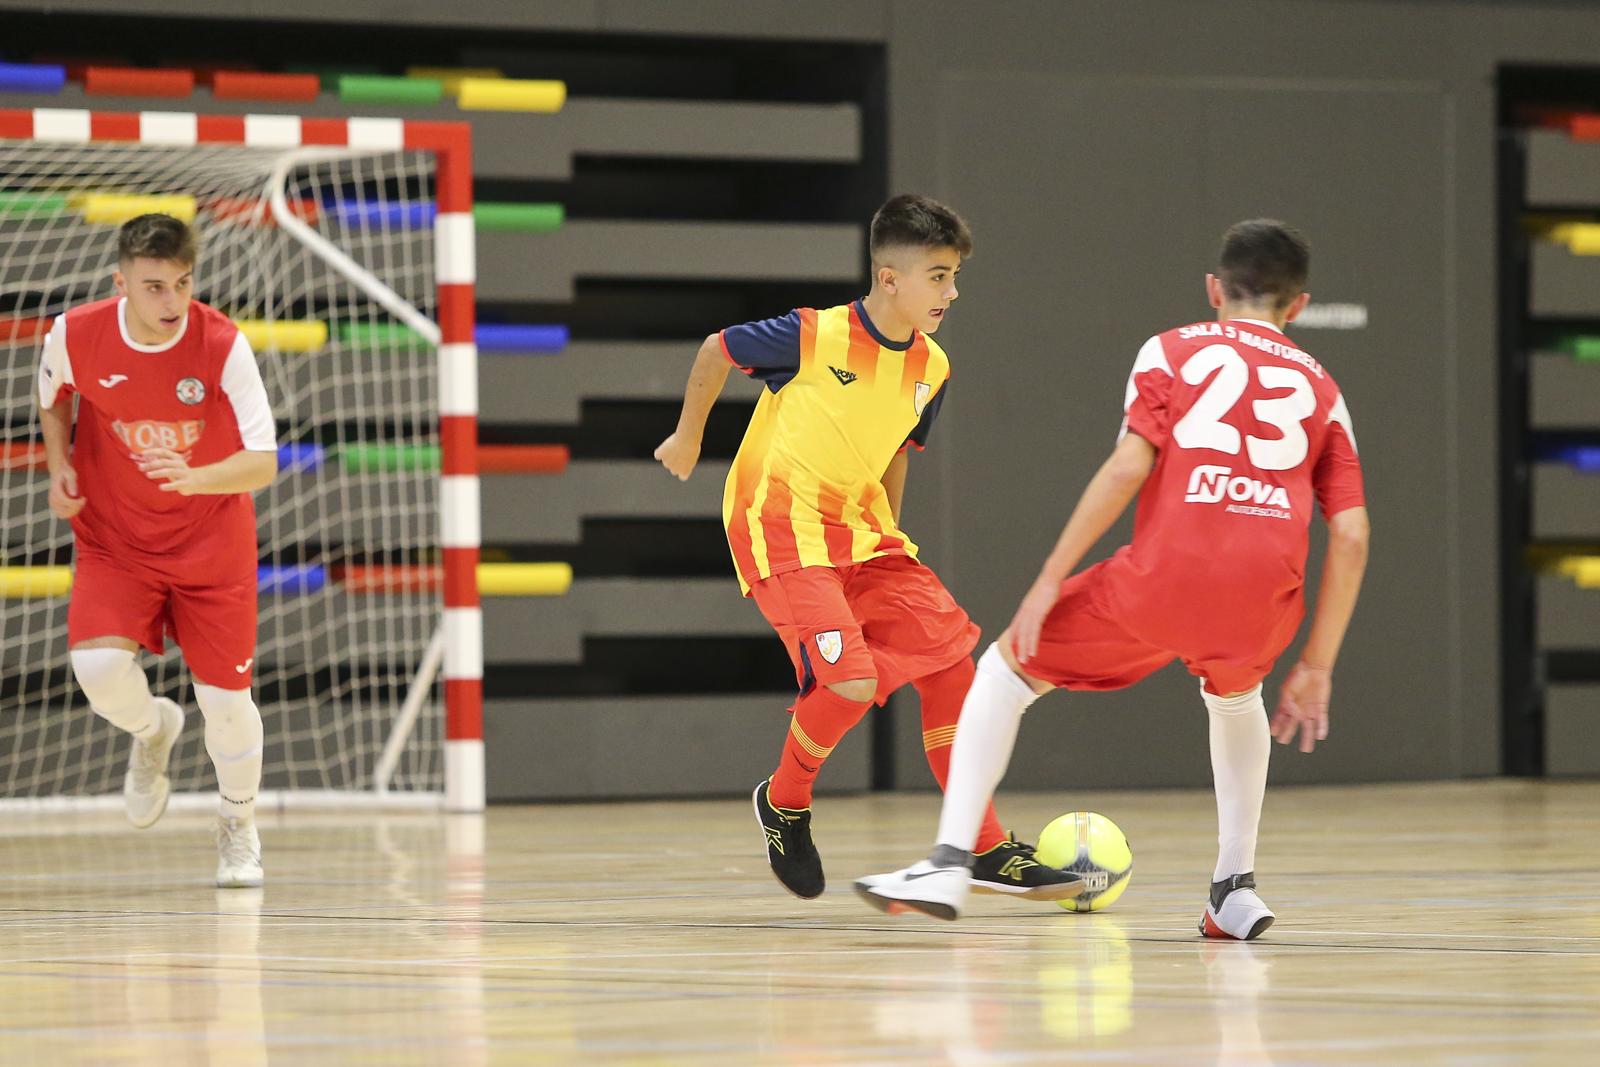 Ibai Espinosa (FCF)